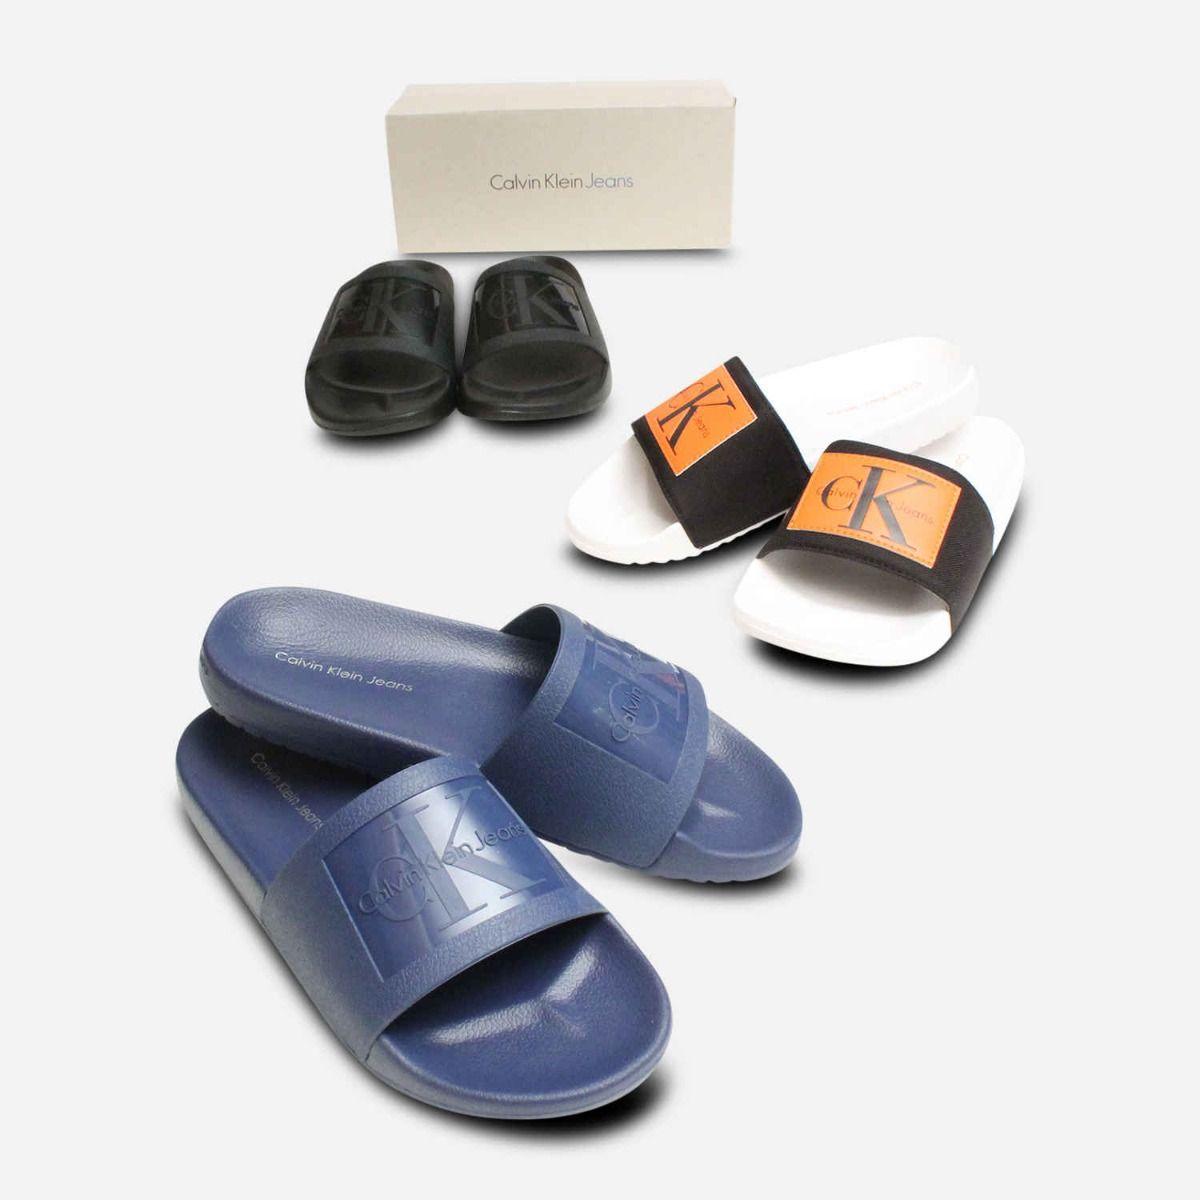 Vincenzo Black Jelly Calvin Klein Mens Slide Sandals Calvin Klein Men'S Leather Sandals Shoes